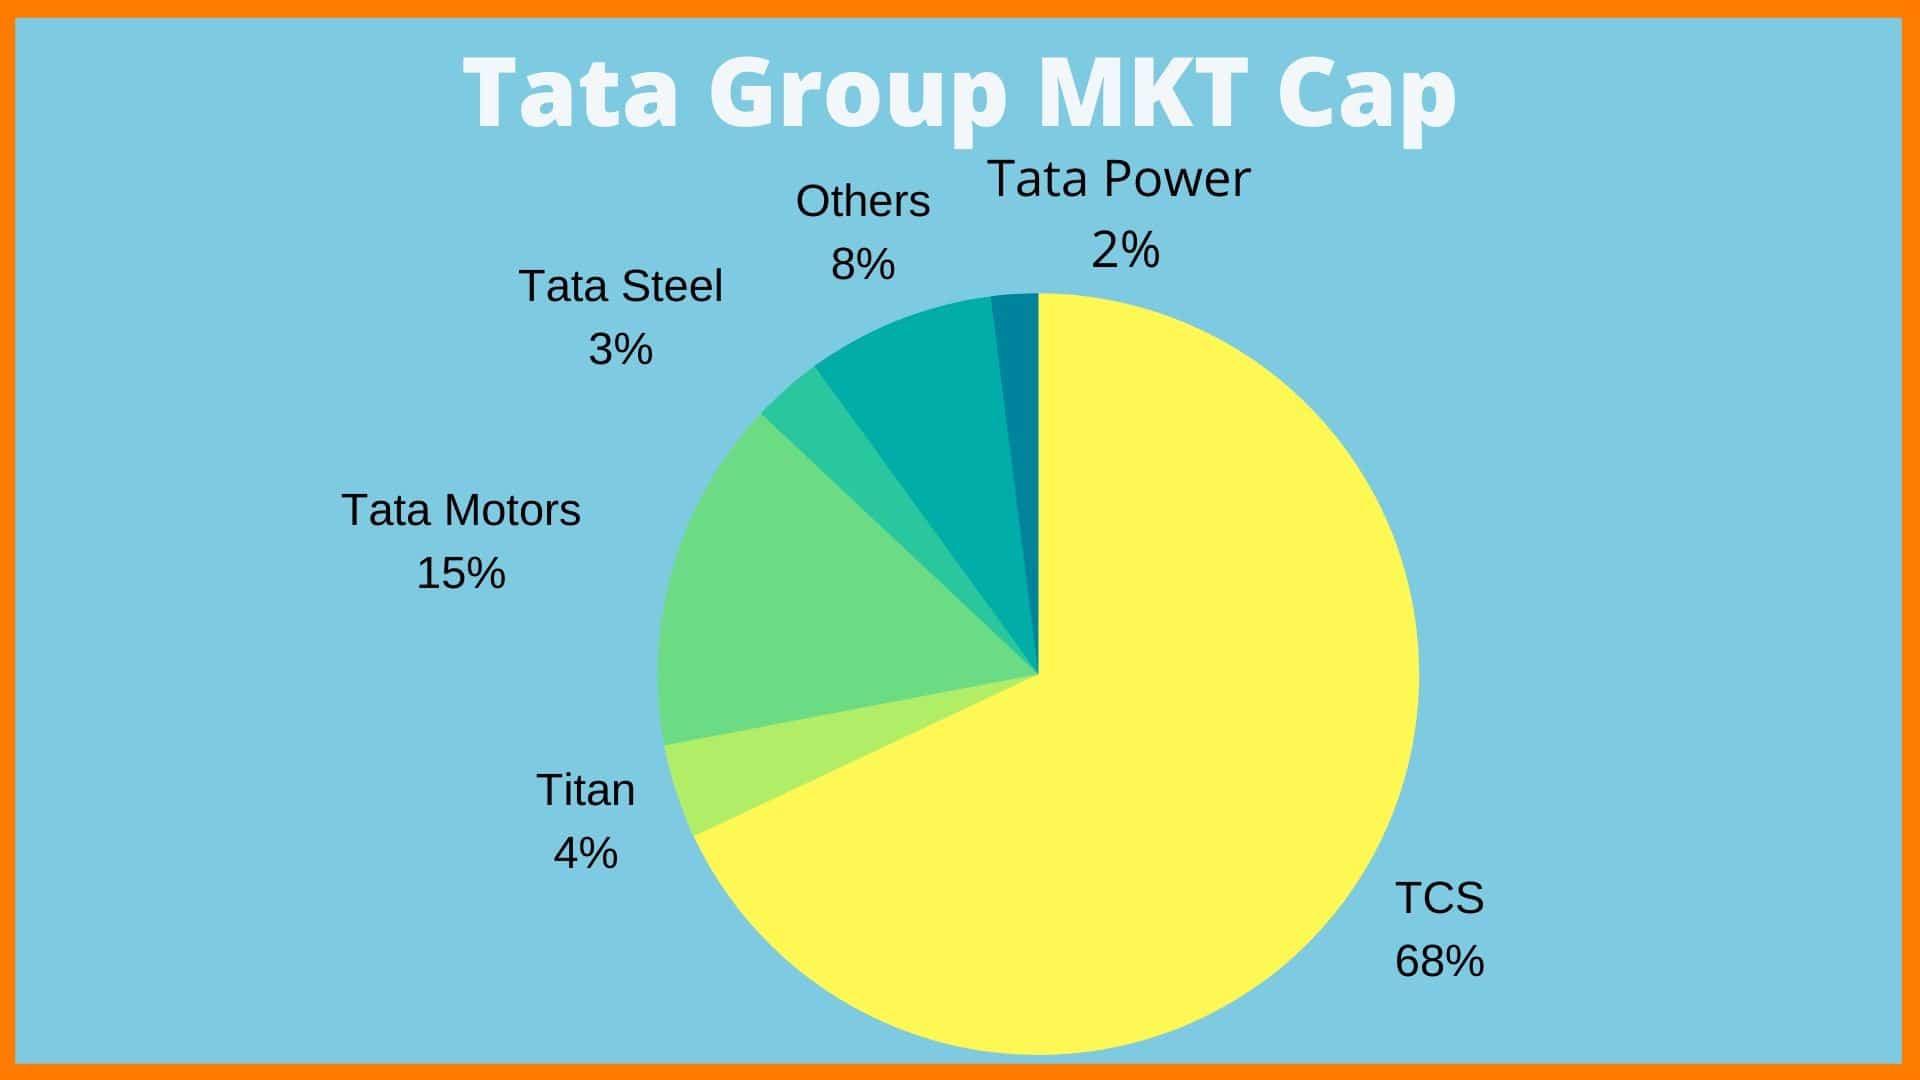 Tata Group MKT Cap